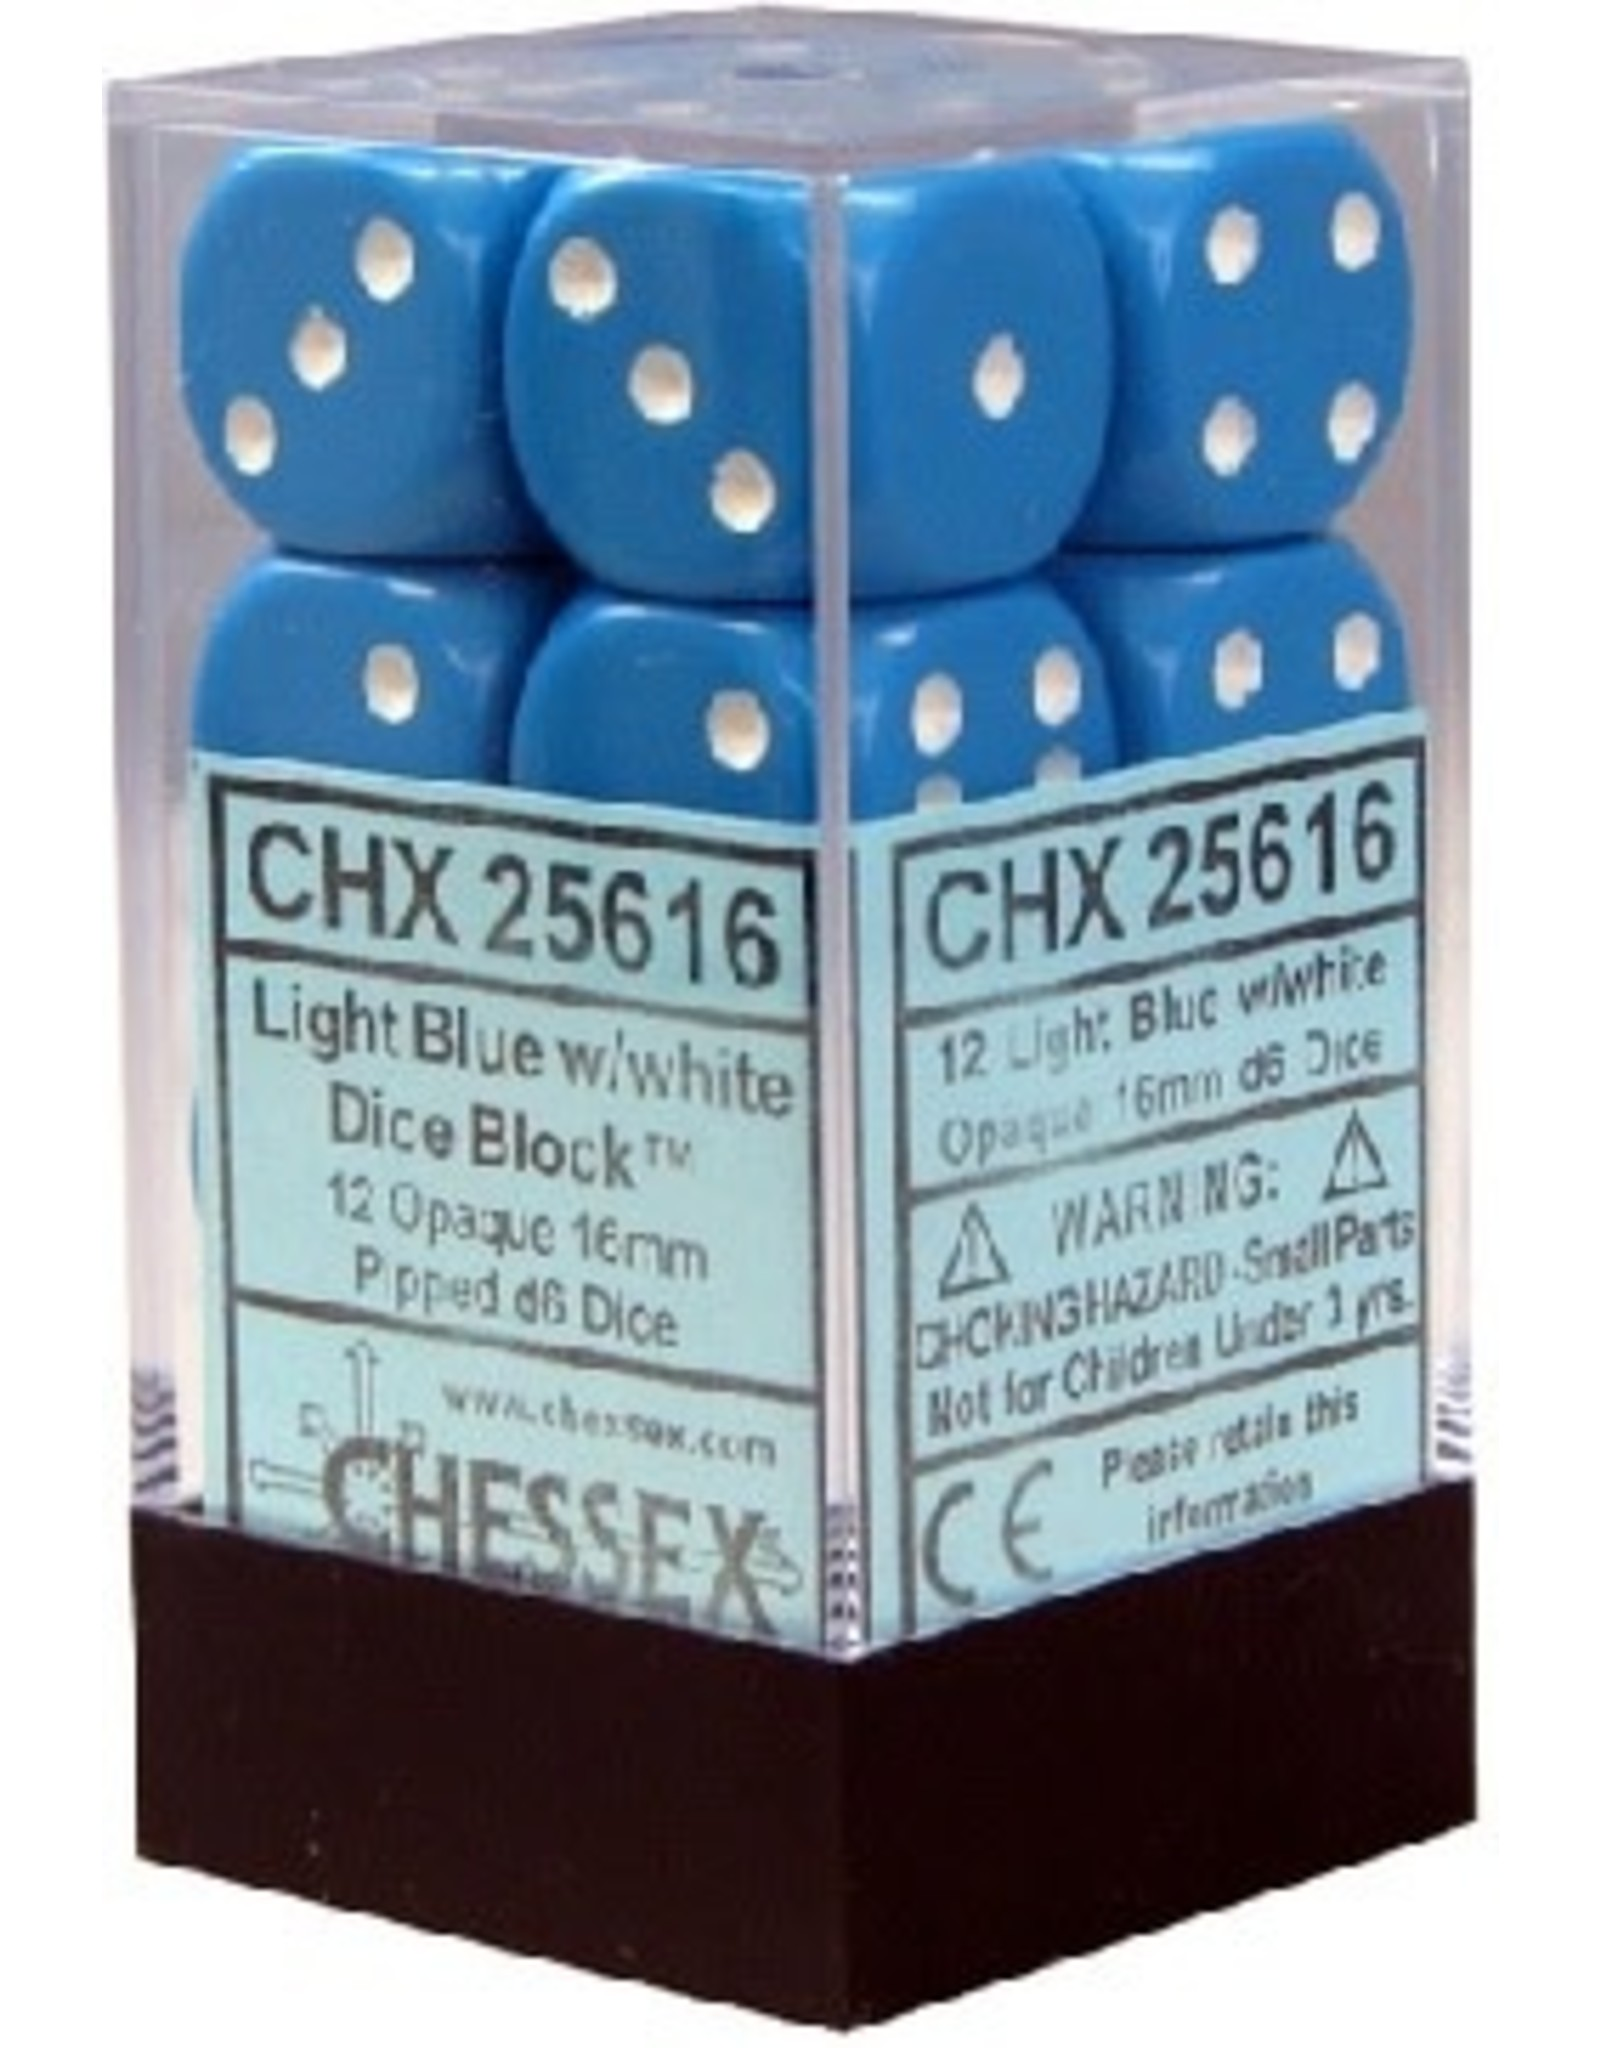 CHESSEX OPAQUE 12D6 LIGHT BLUE/WHITE 16MM